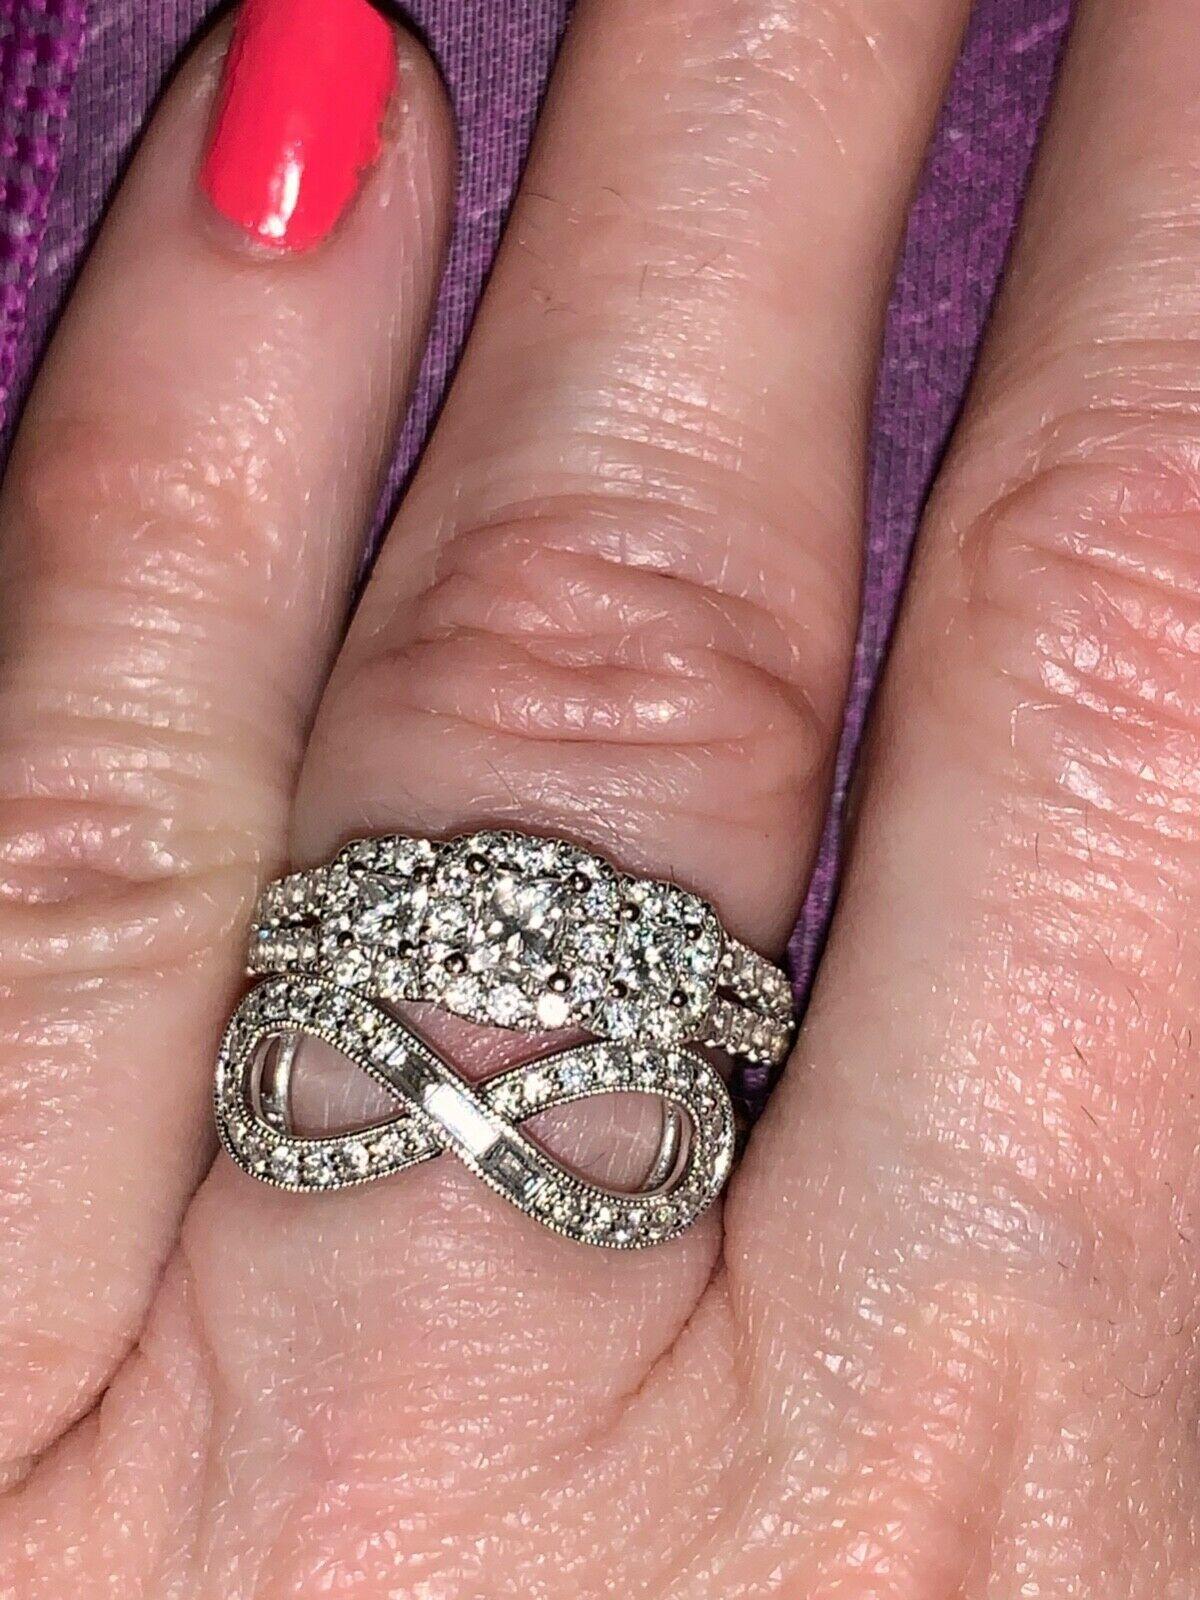 As Nwt Kay Jewelers Leo Diamond Bridal Collection Engagement Ring Retail 24 Leo Diamond Engagement Ring Wedding Rings Engagement White Gold Diamond Engagement